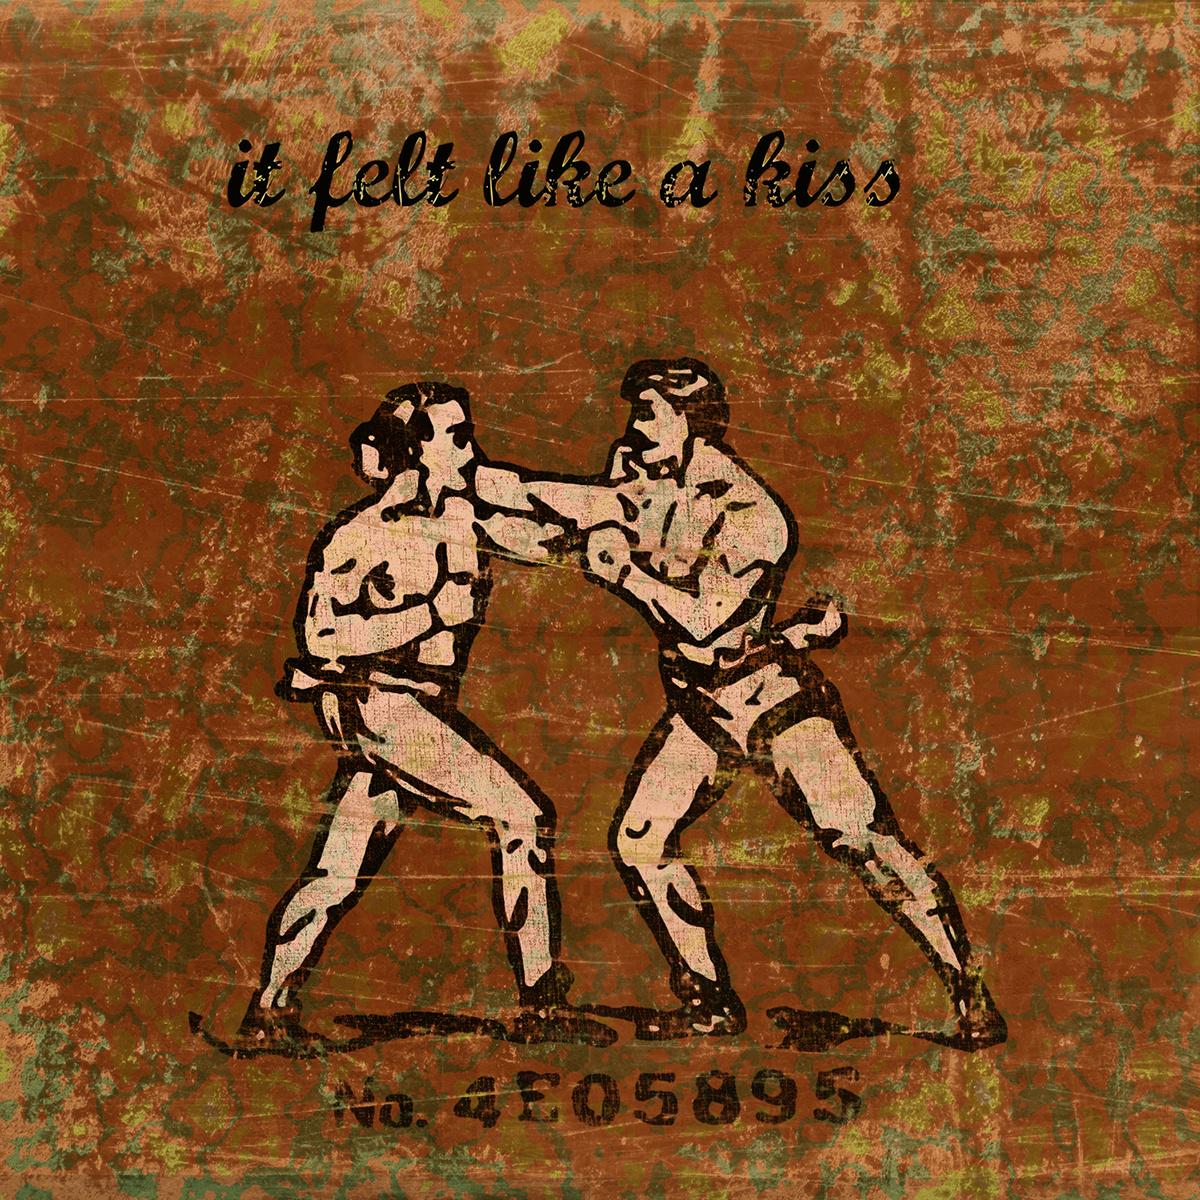 https://0201.nccdn.net/1_2/000/000/16c/71c/boxers-1200x1200.jpg